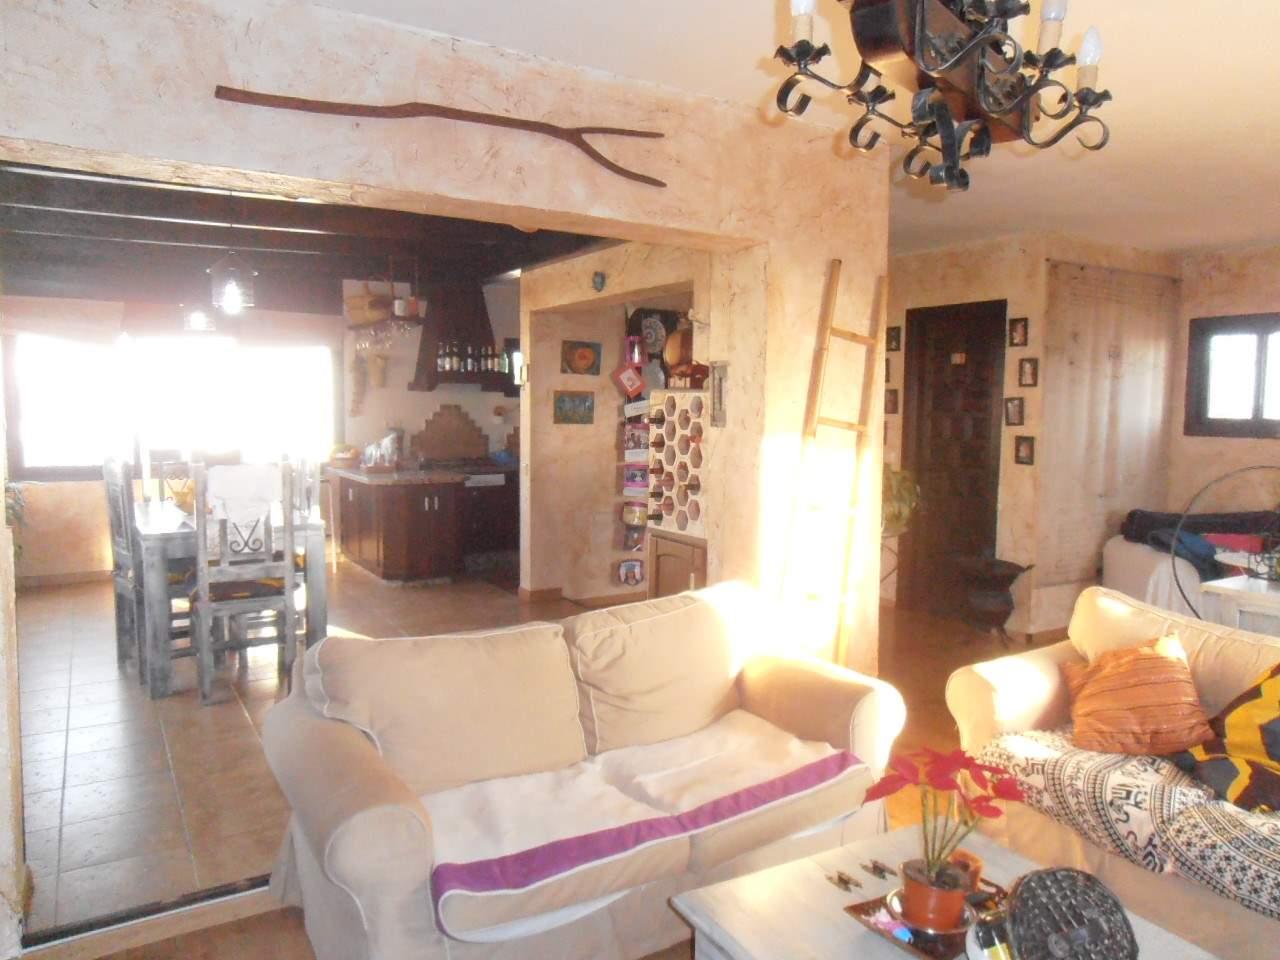 3 bedroom Villa for sale in Marbella with pool - € 255,000 (Ref: 3537164)